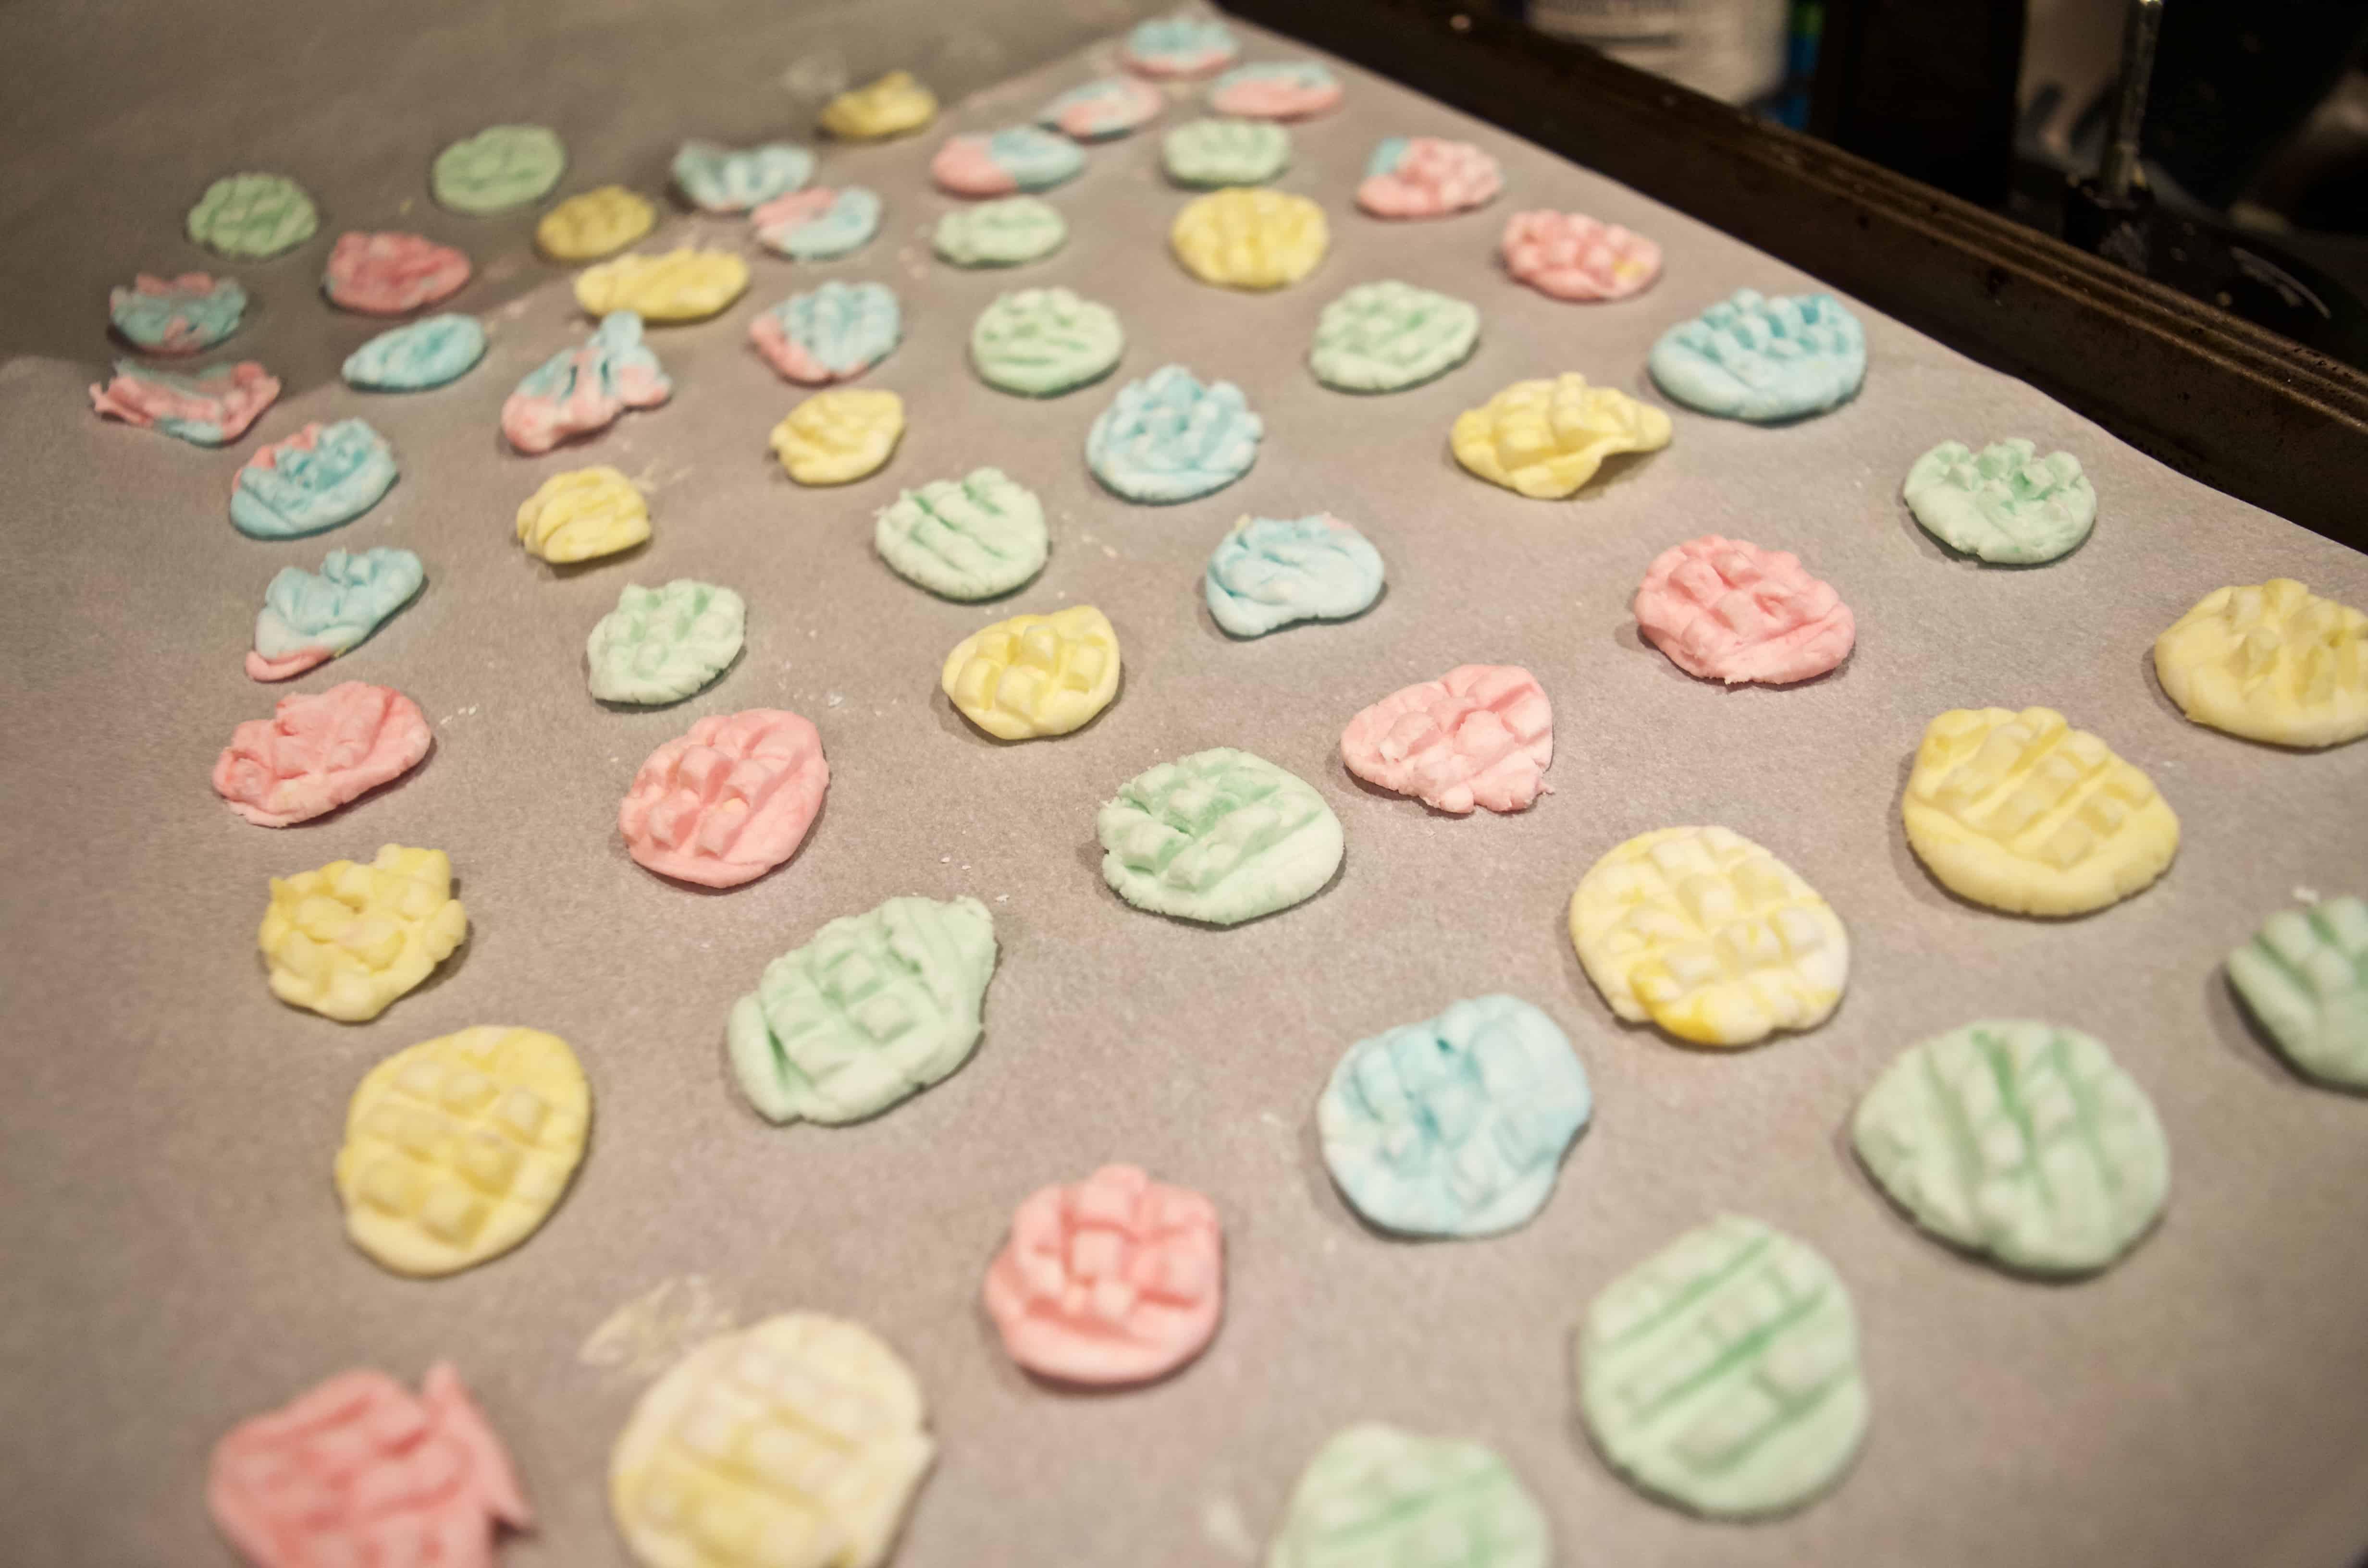 Creamy Candy Melts